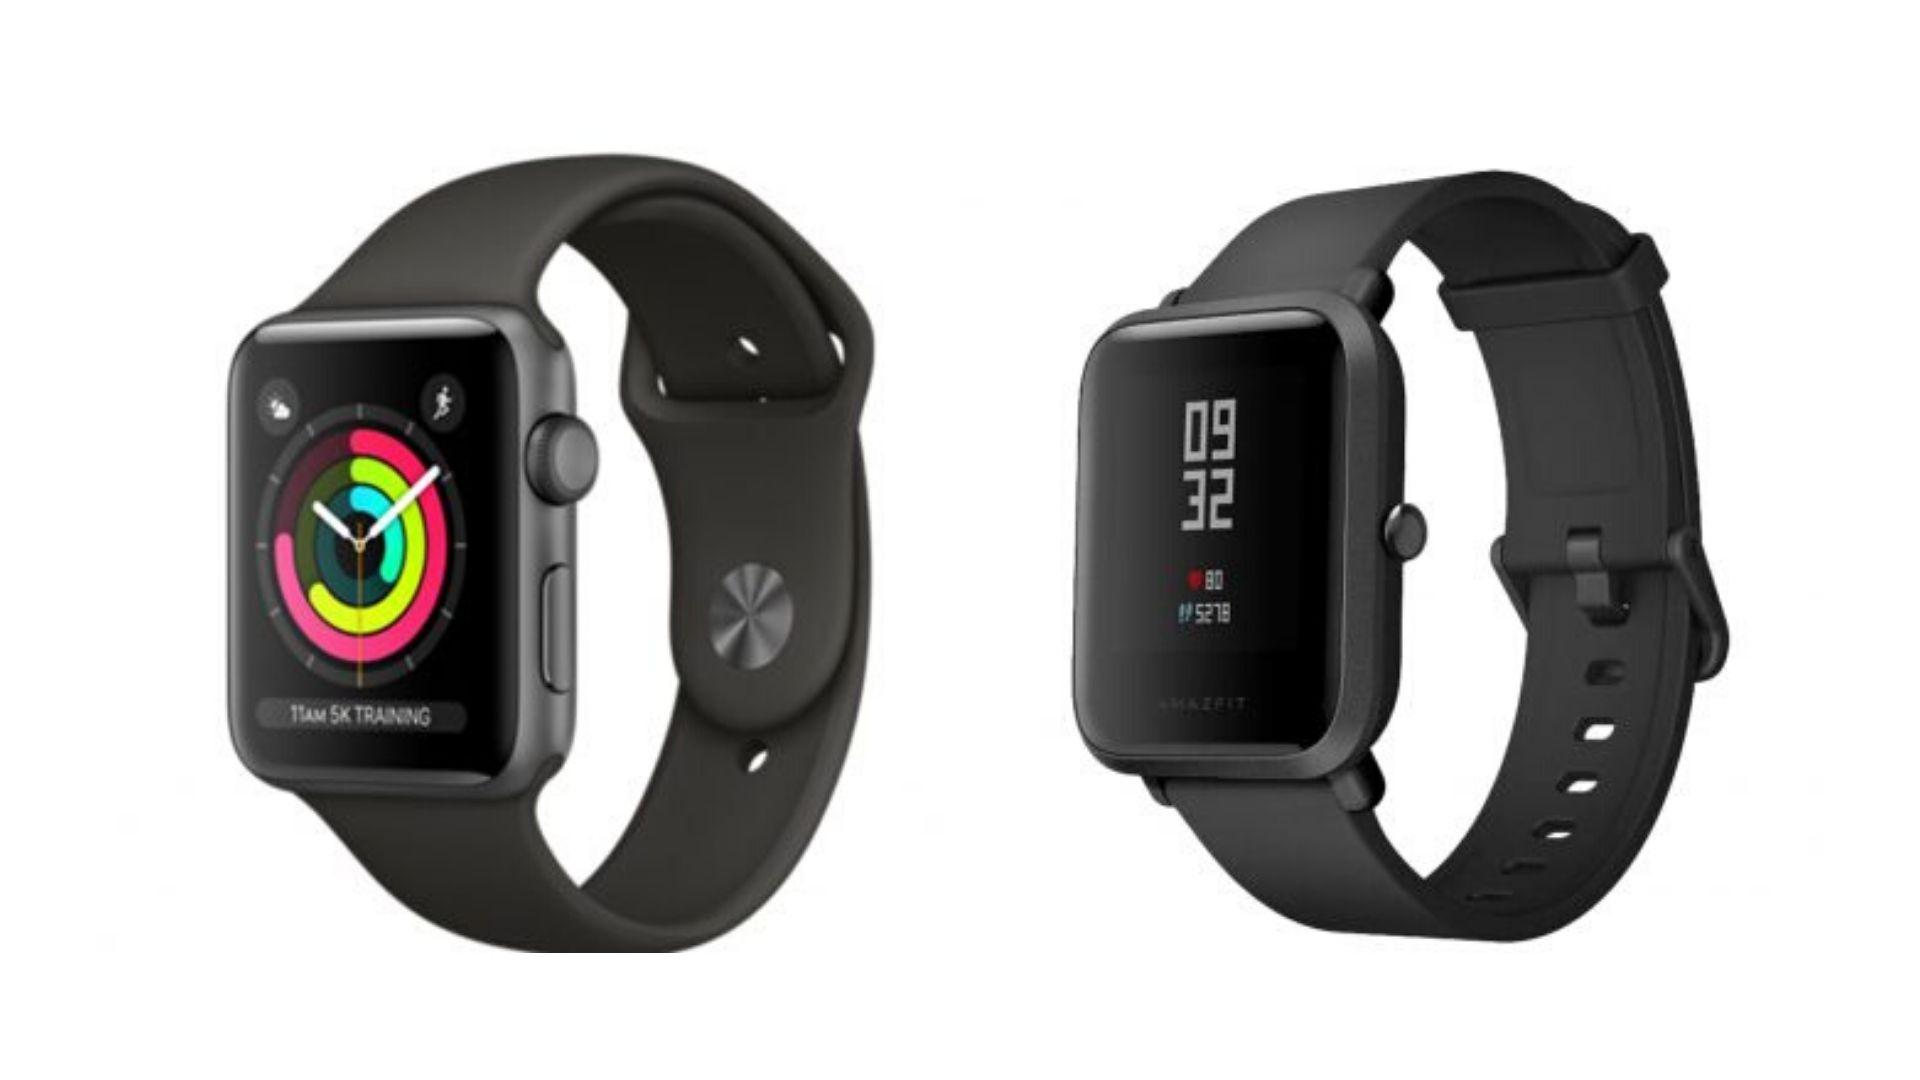 Apple Watch vs. Amazfit Bip: Bedste smartwatch til prisen